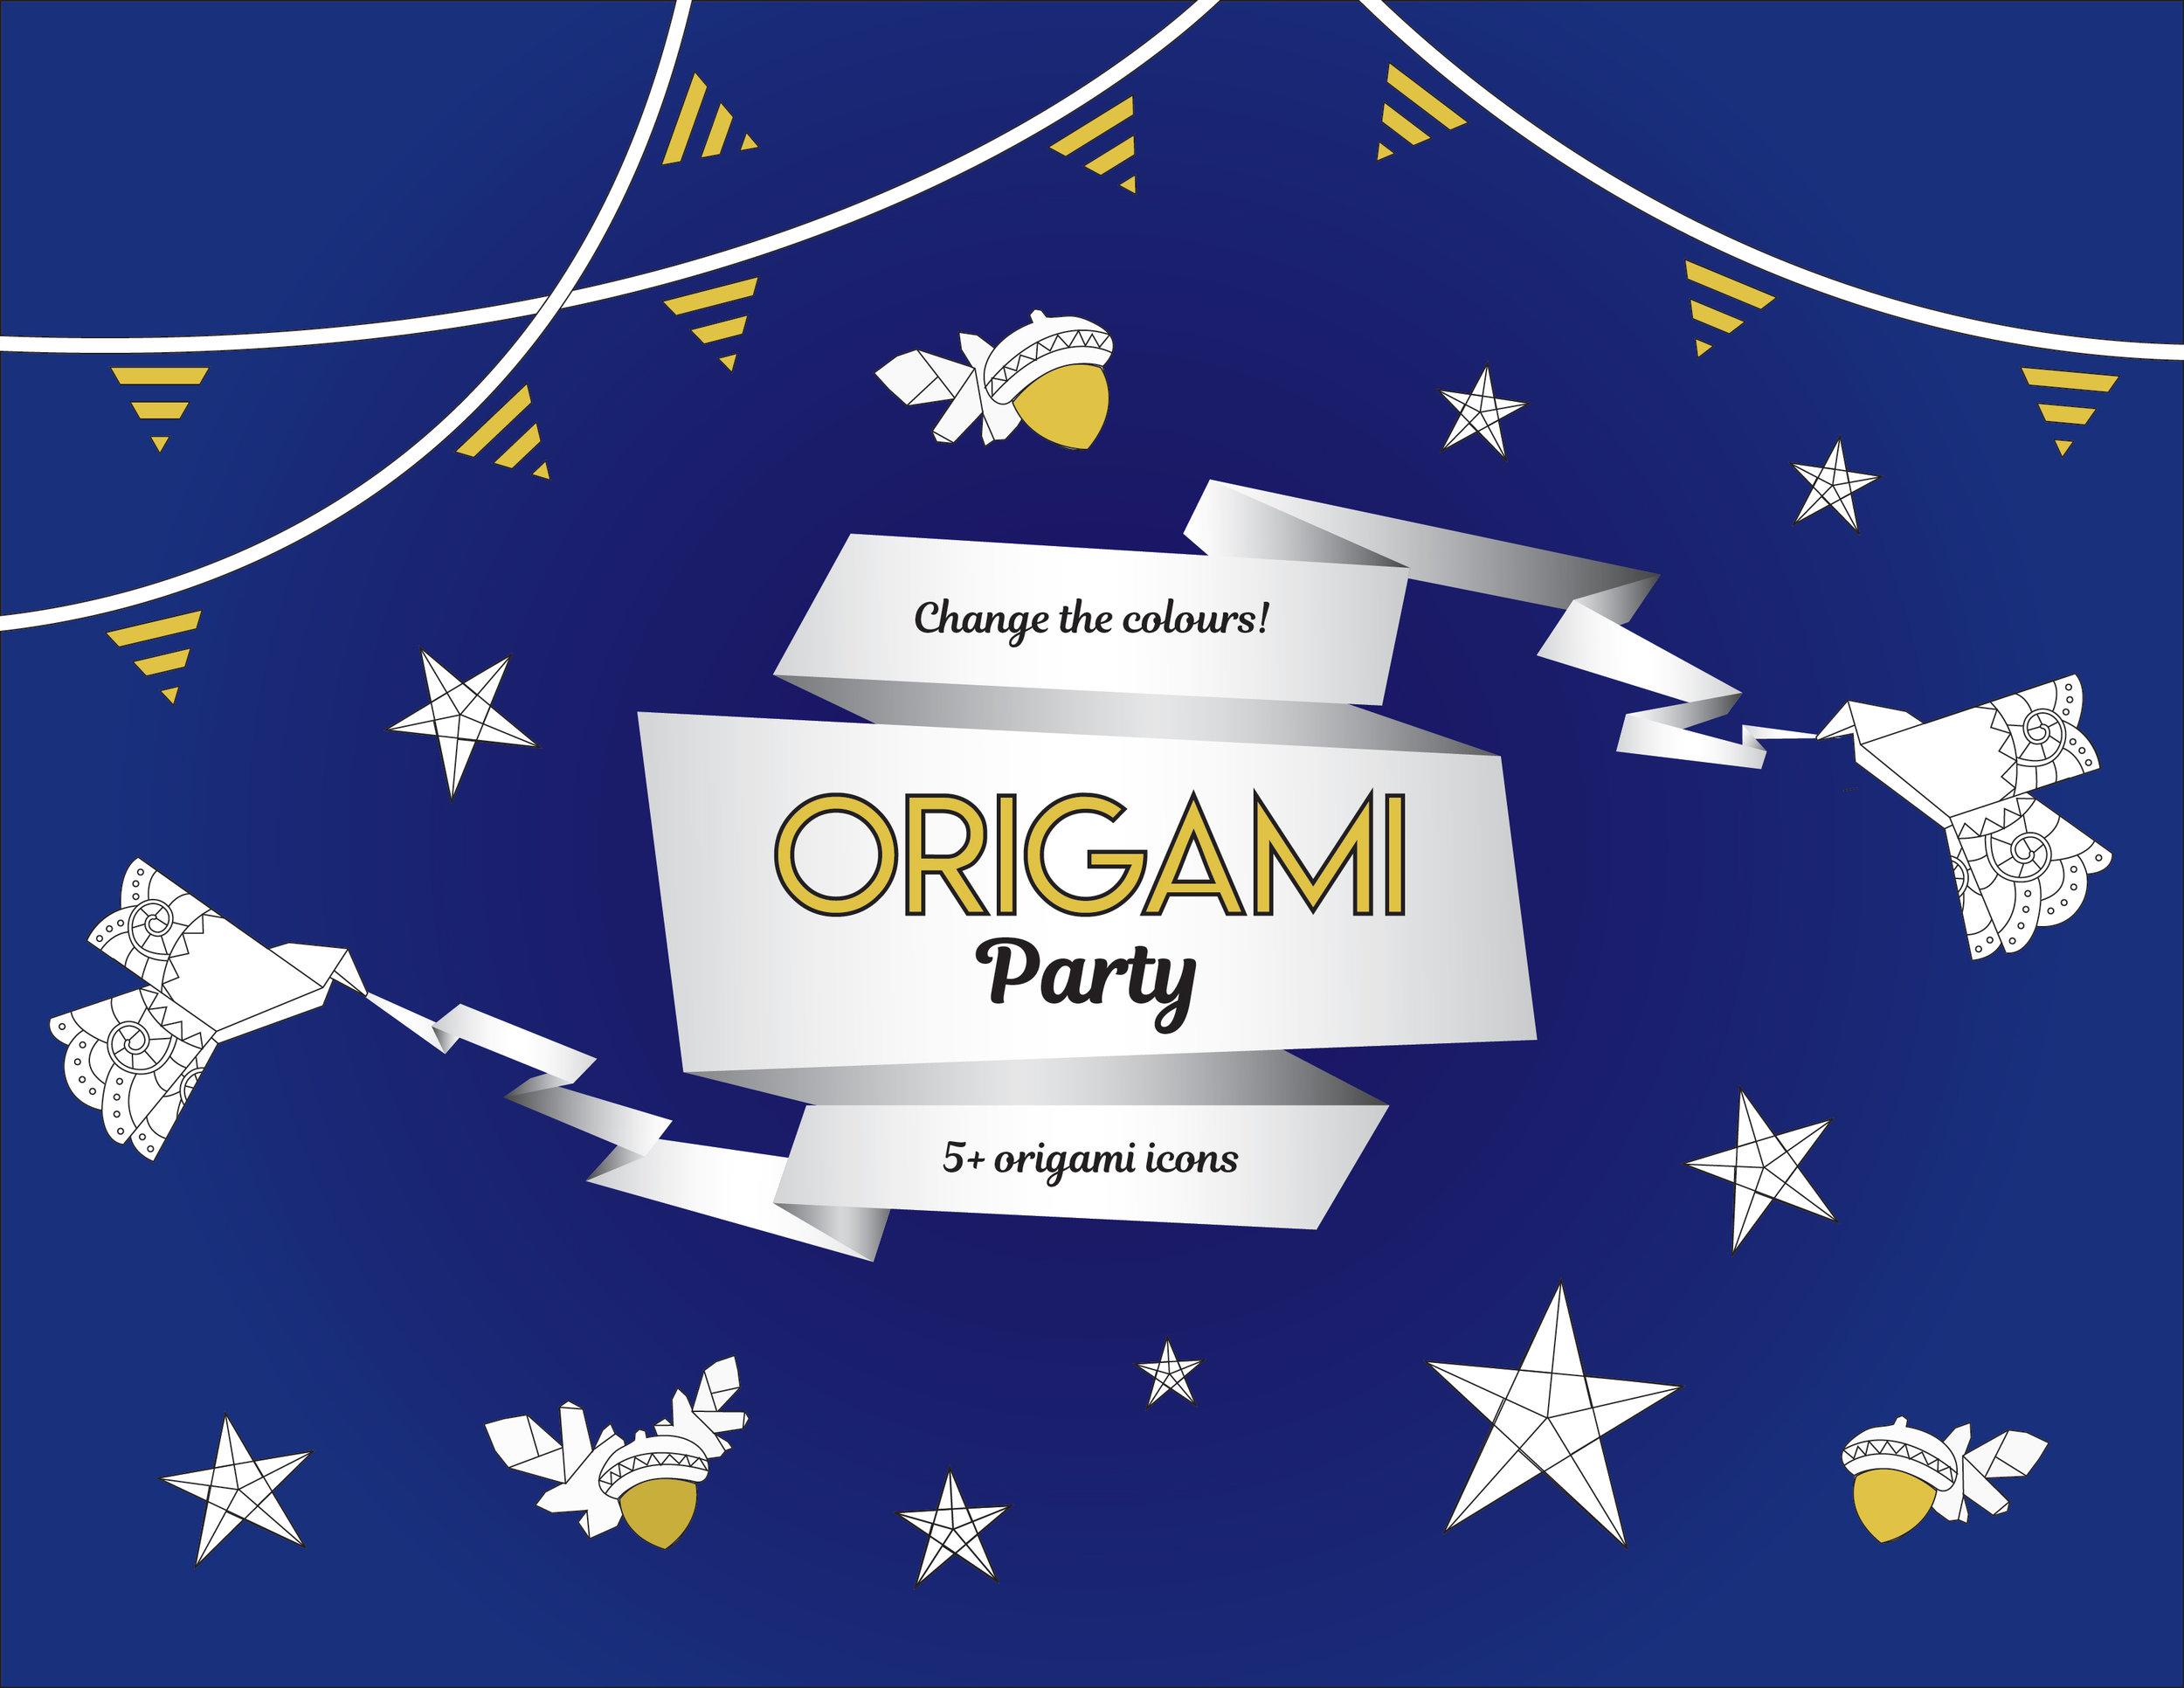 Origami-graphics-Oct2018-02.jpg